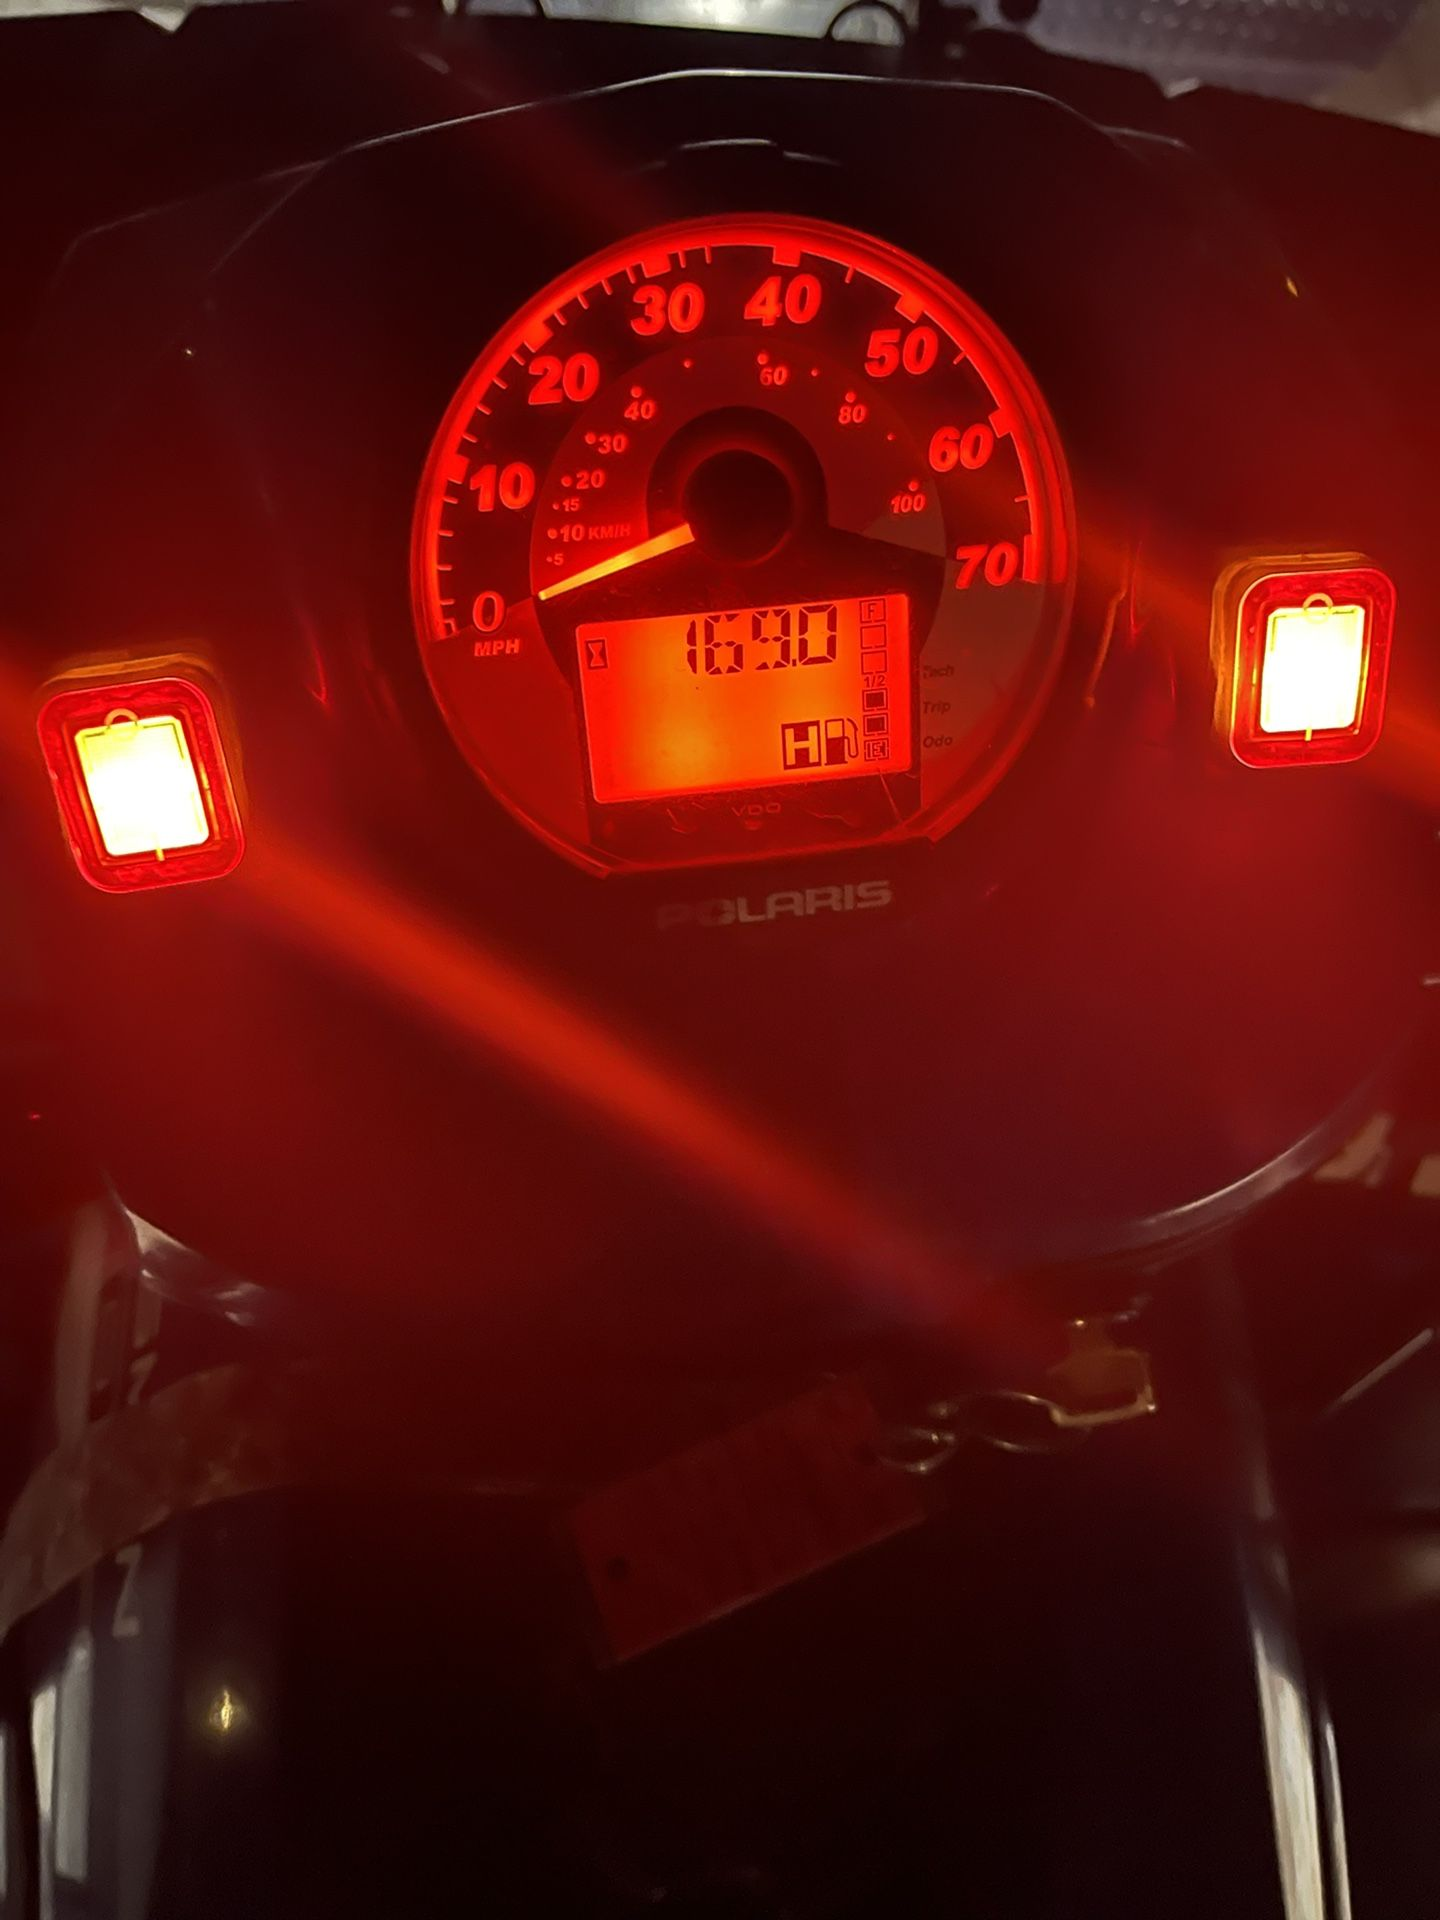 Polaris Sportsman 800cc 4x4 Automatica